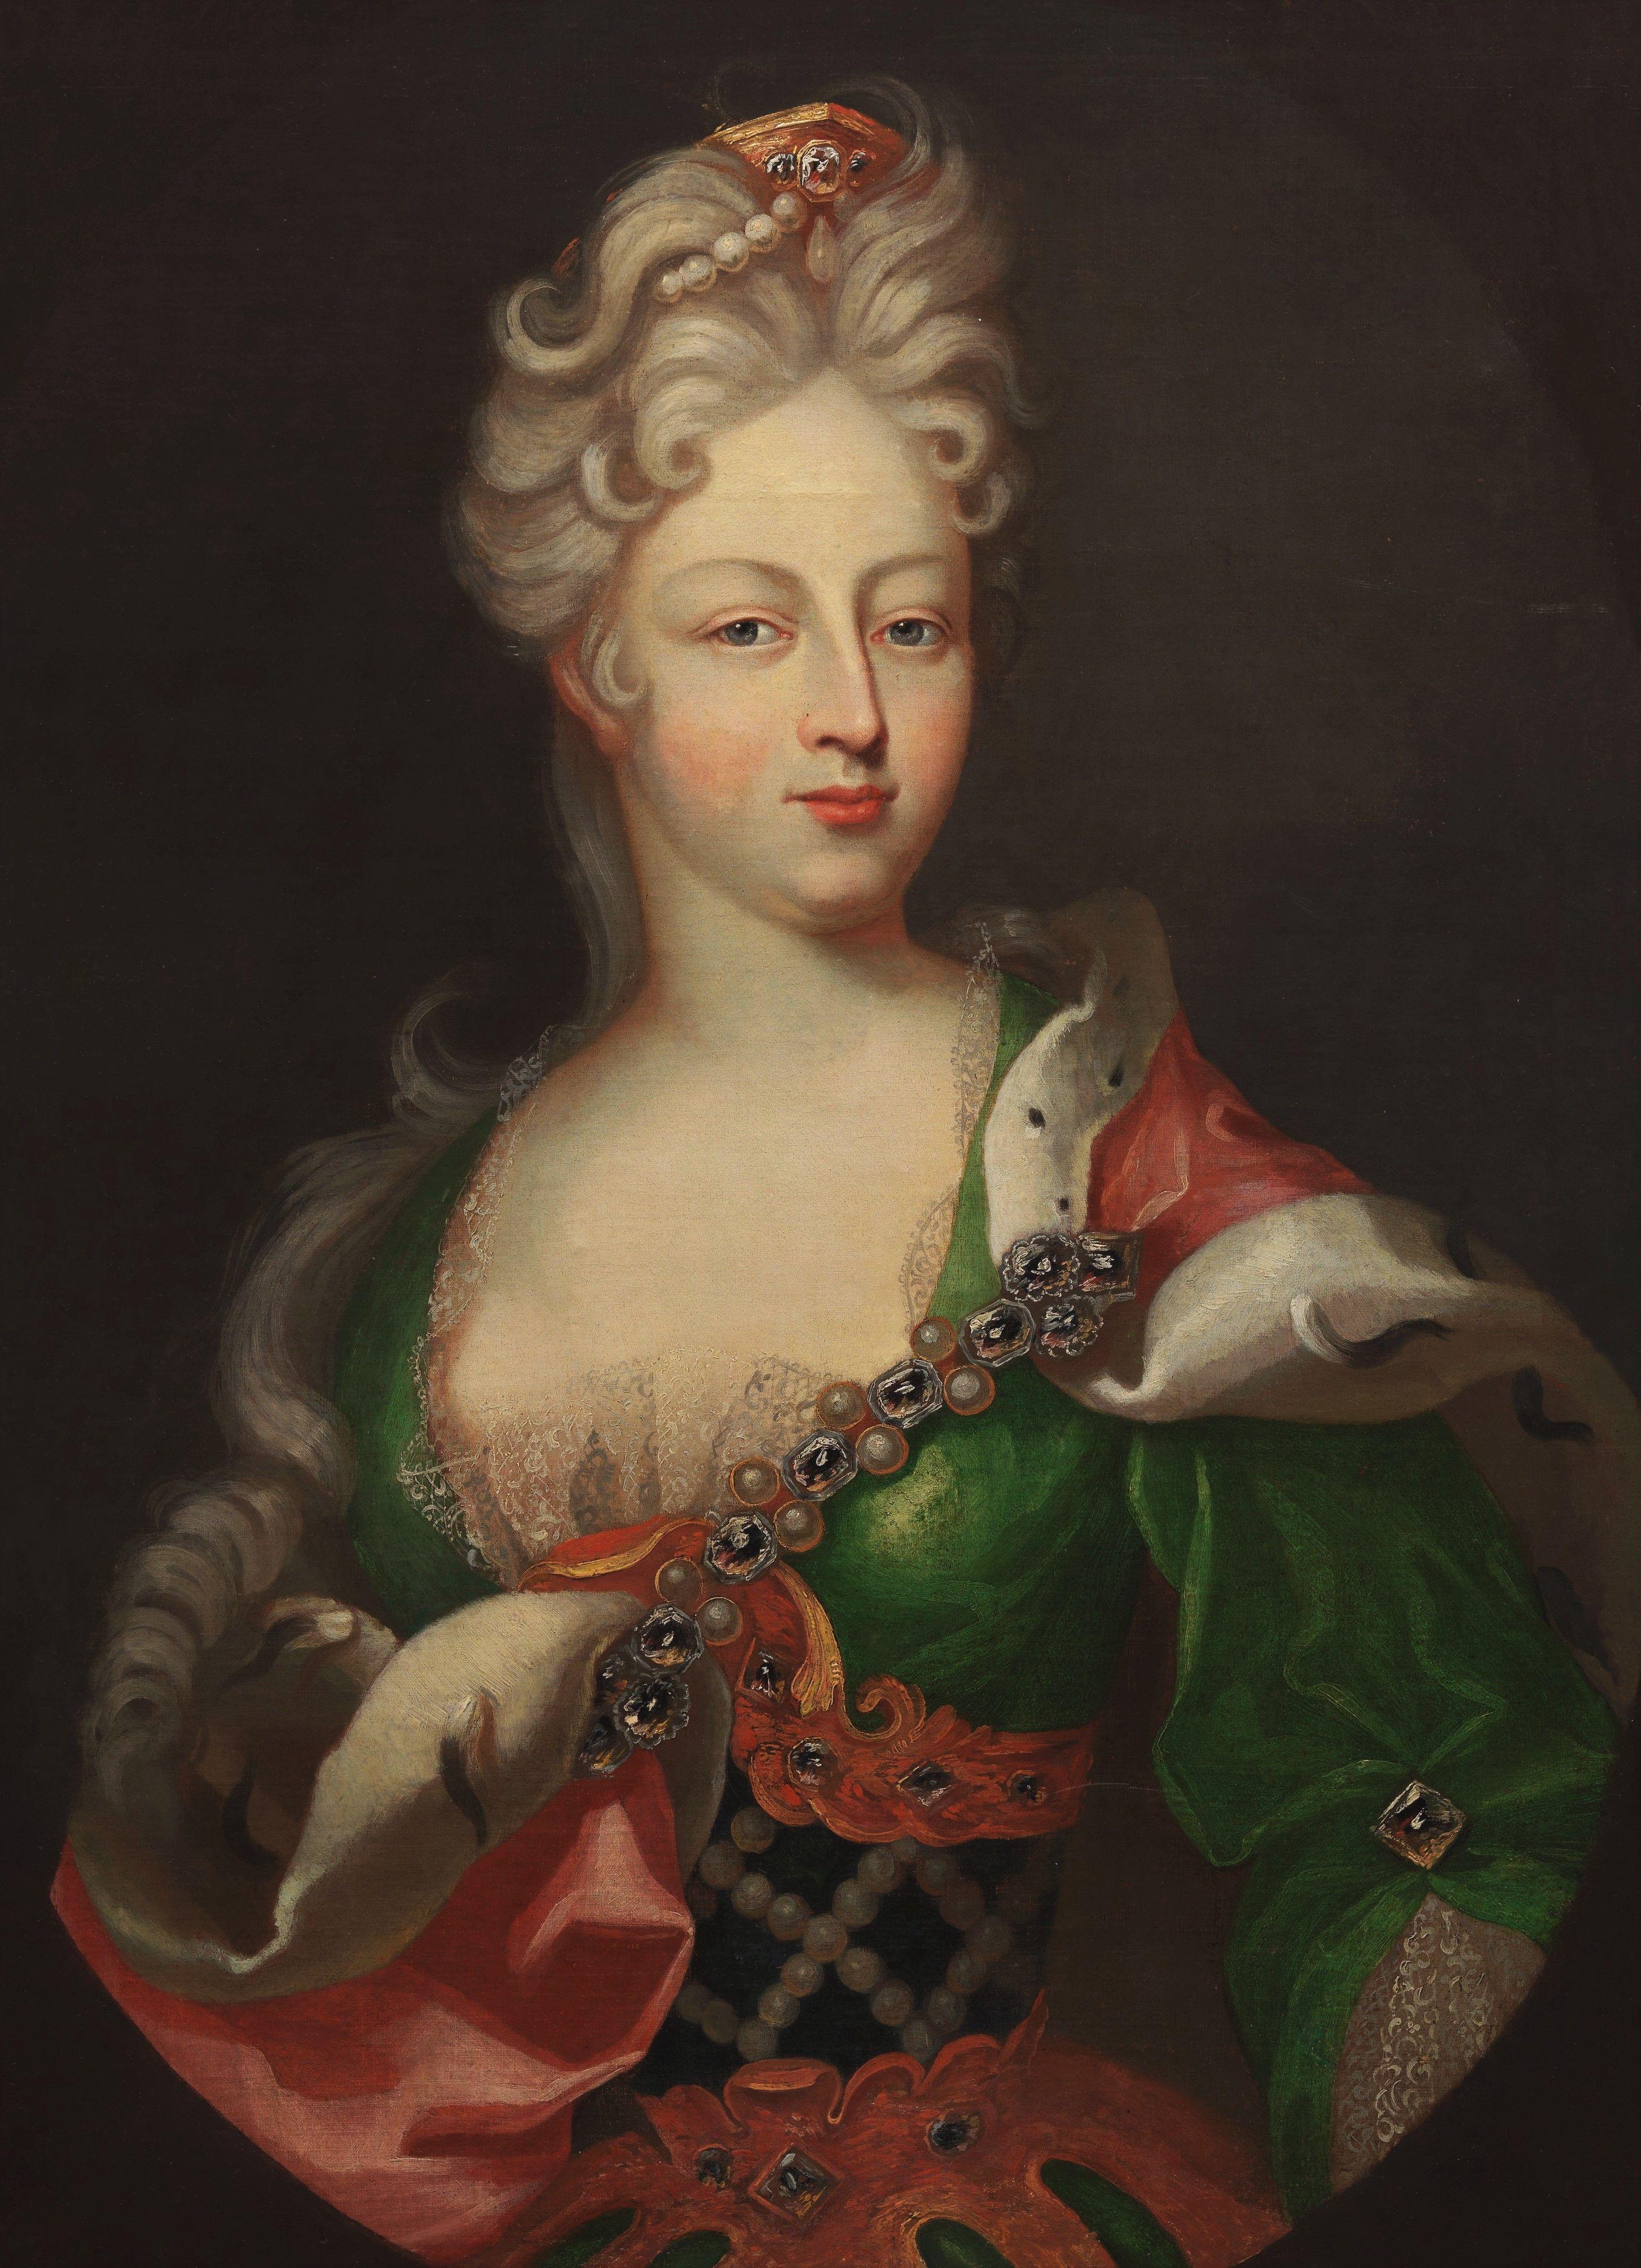 Caroline, Queen of United Kingdom | 19th century portraits